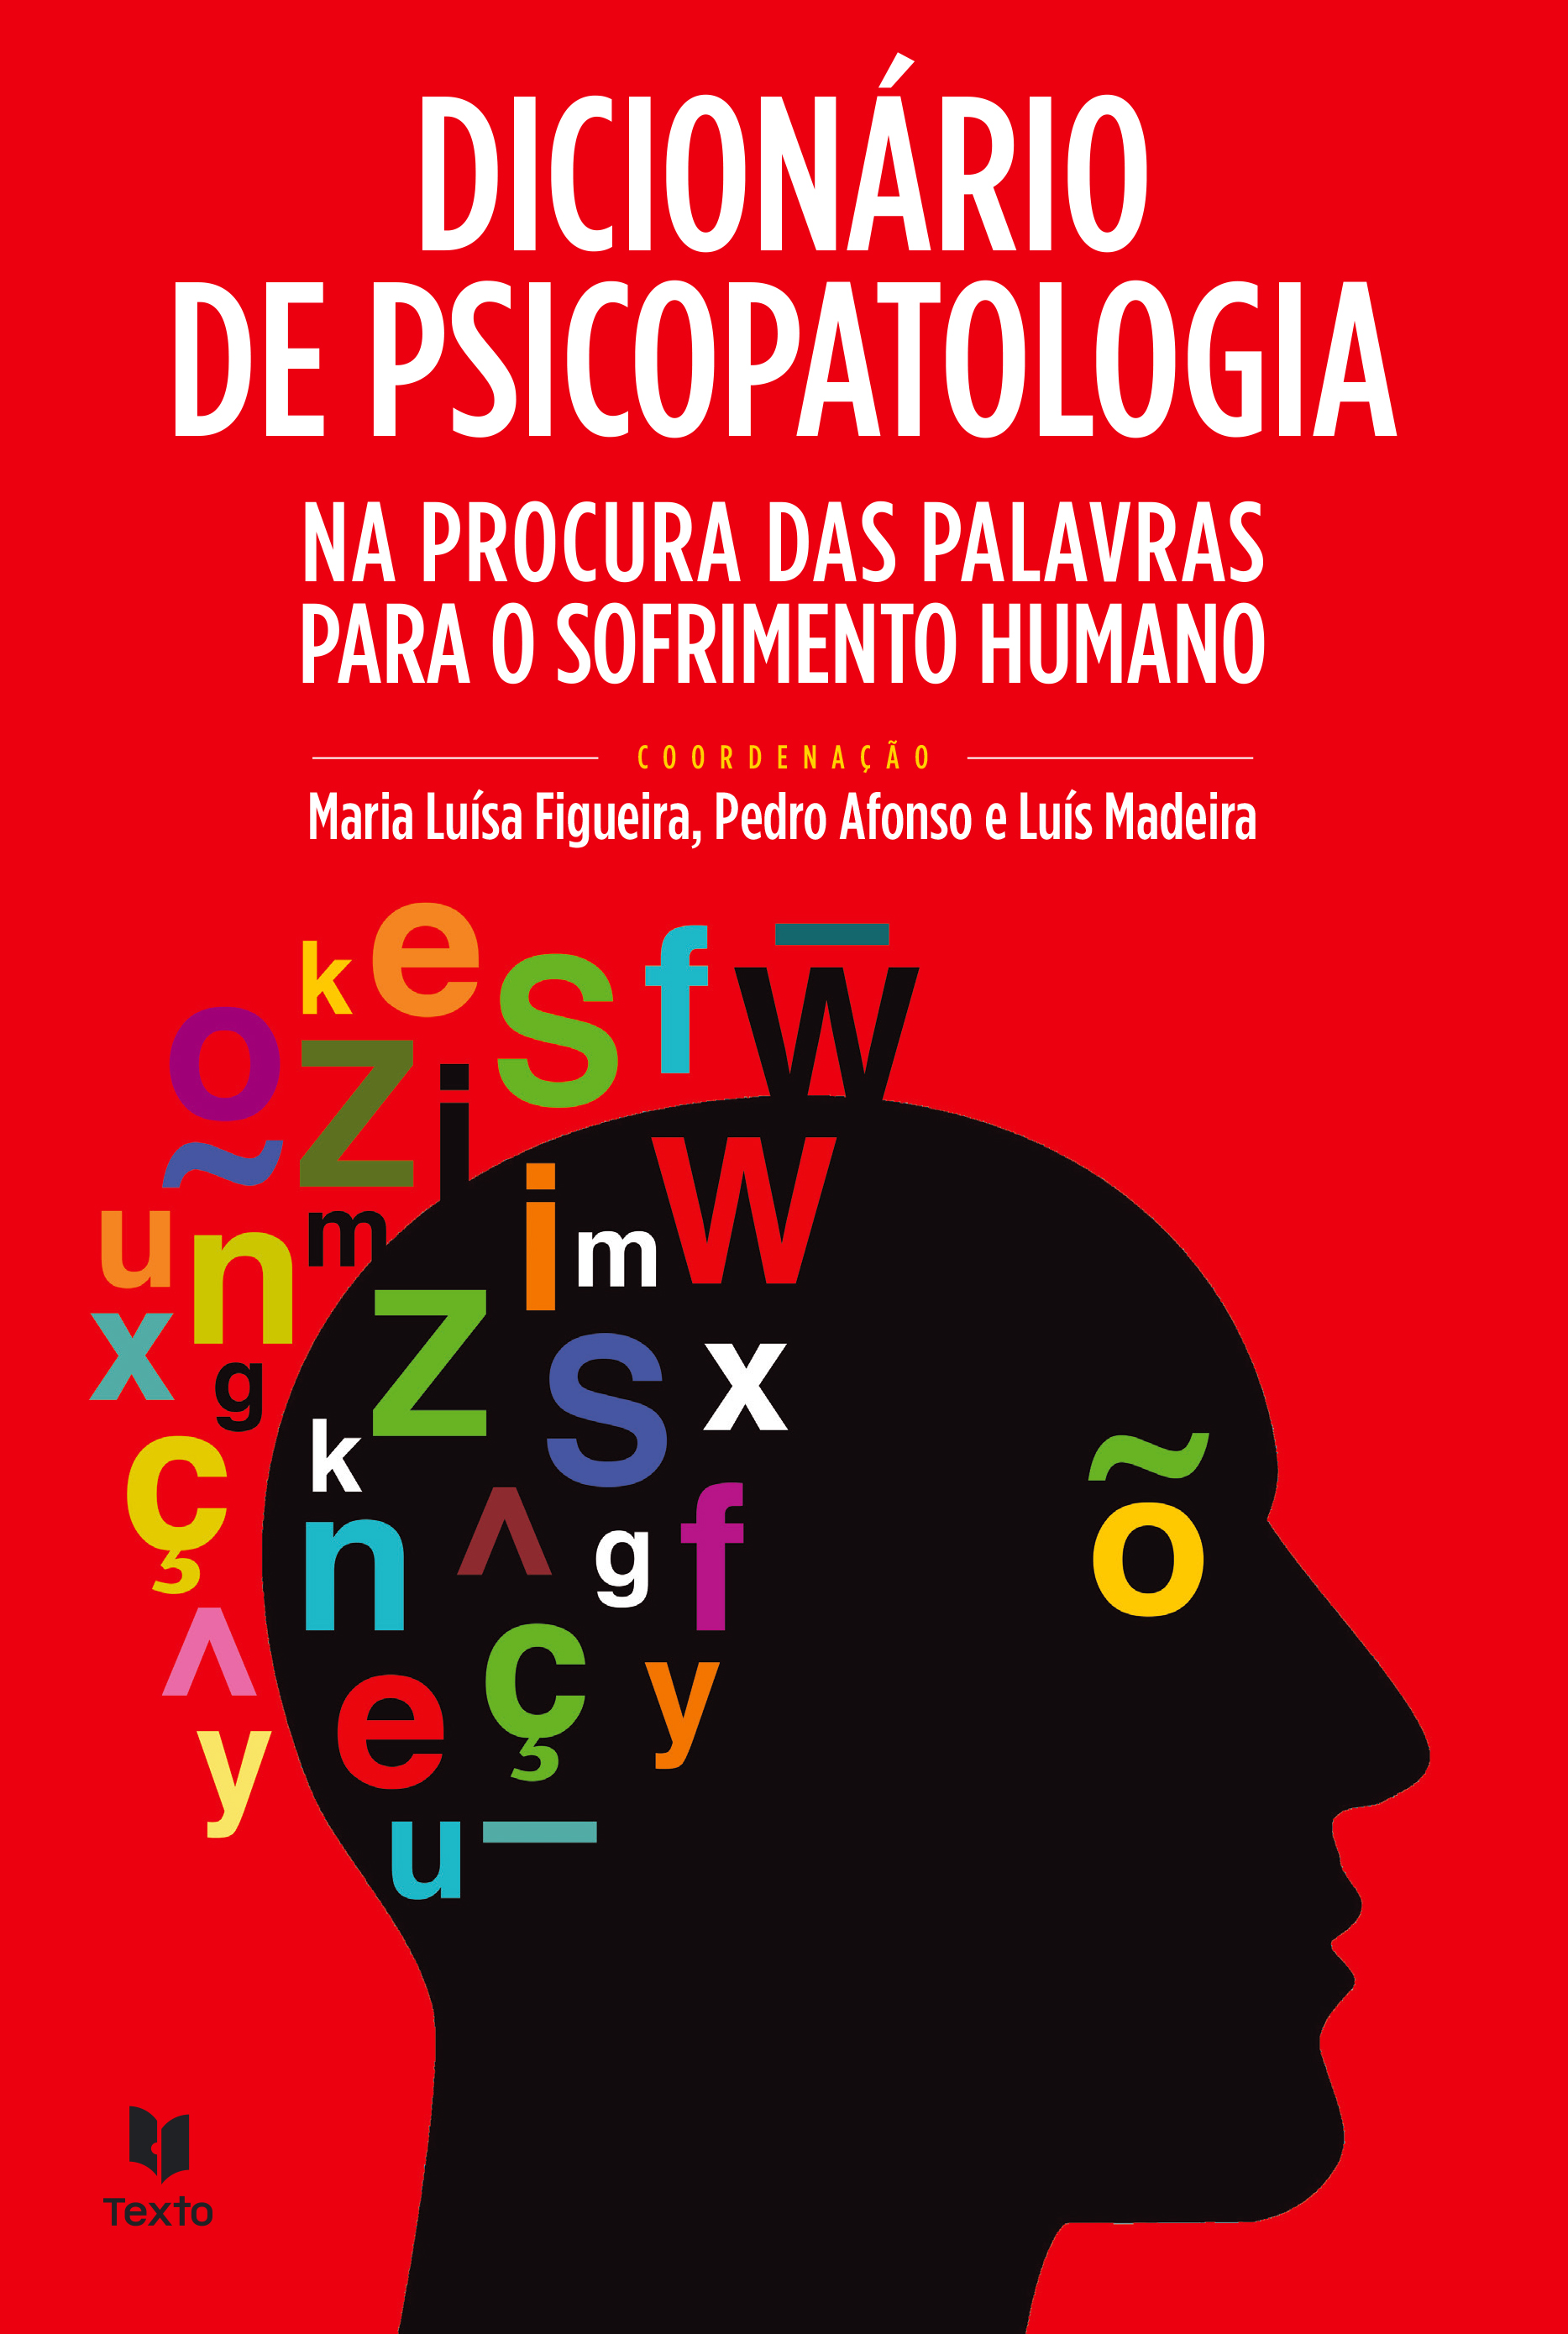 Capa_dicionario_de_psicopatologia